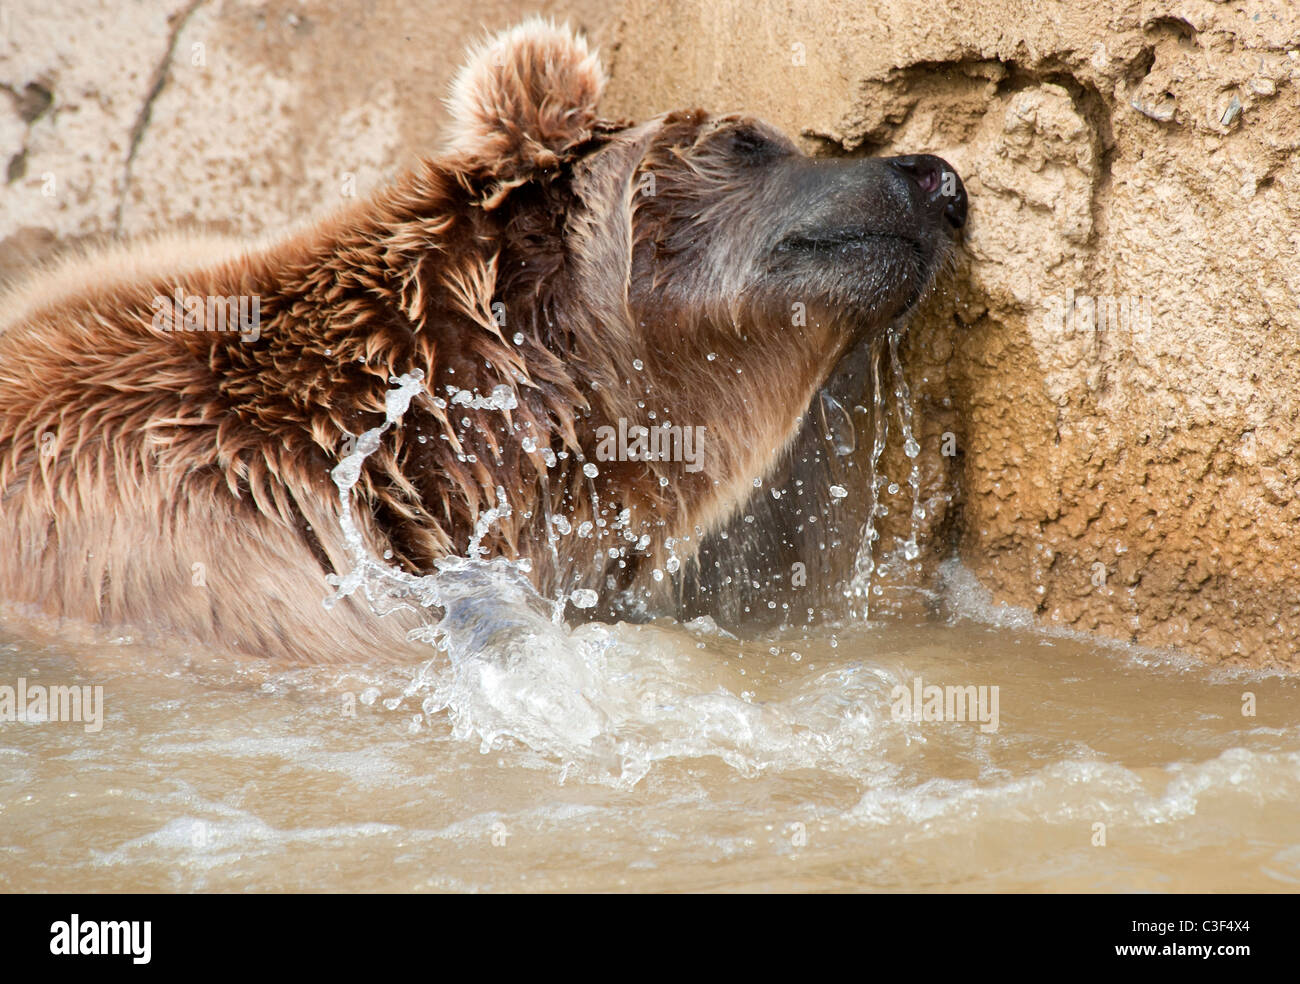 Brown Bear enjoying itself swimming in a pond - Stock Image